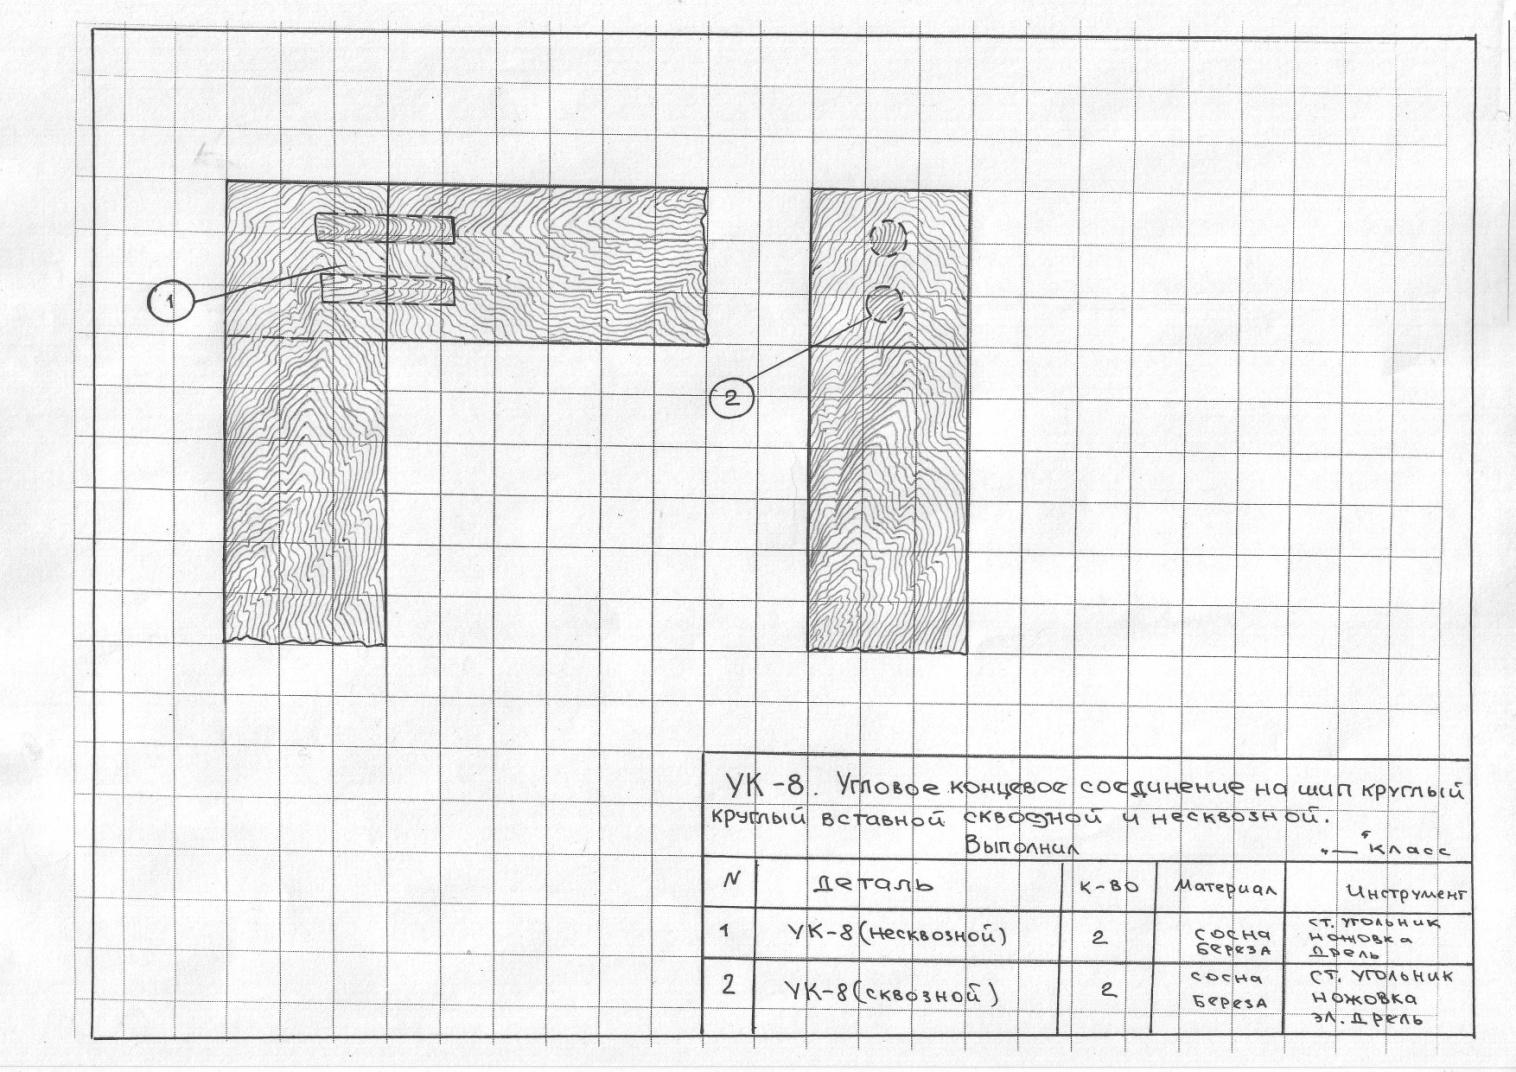 F:\изделия и эскизы\8кл\Image0081.JPG